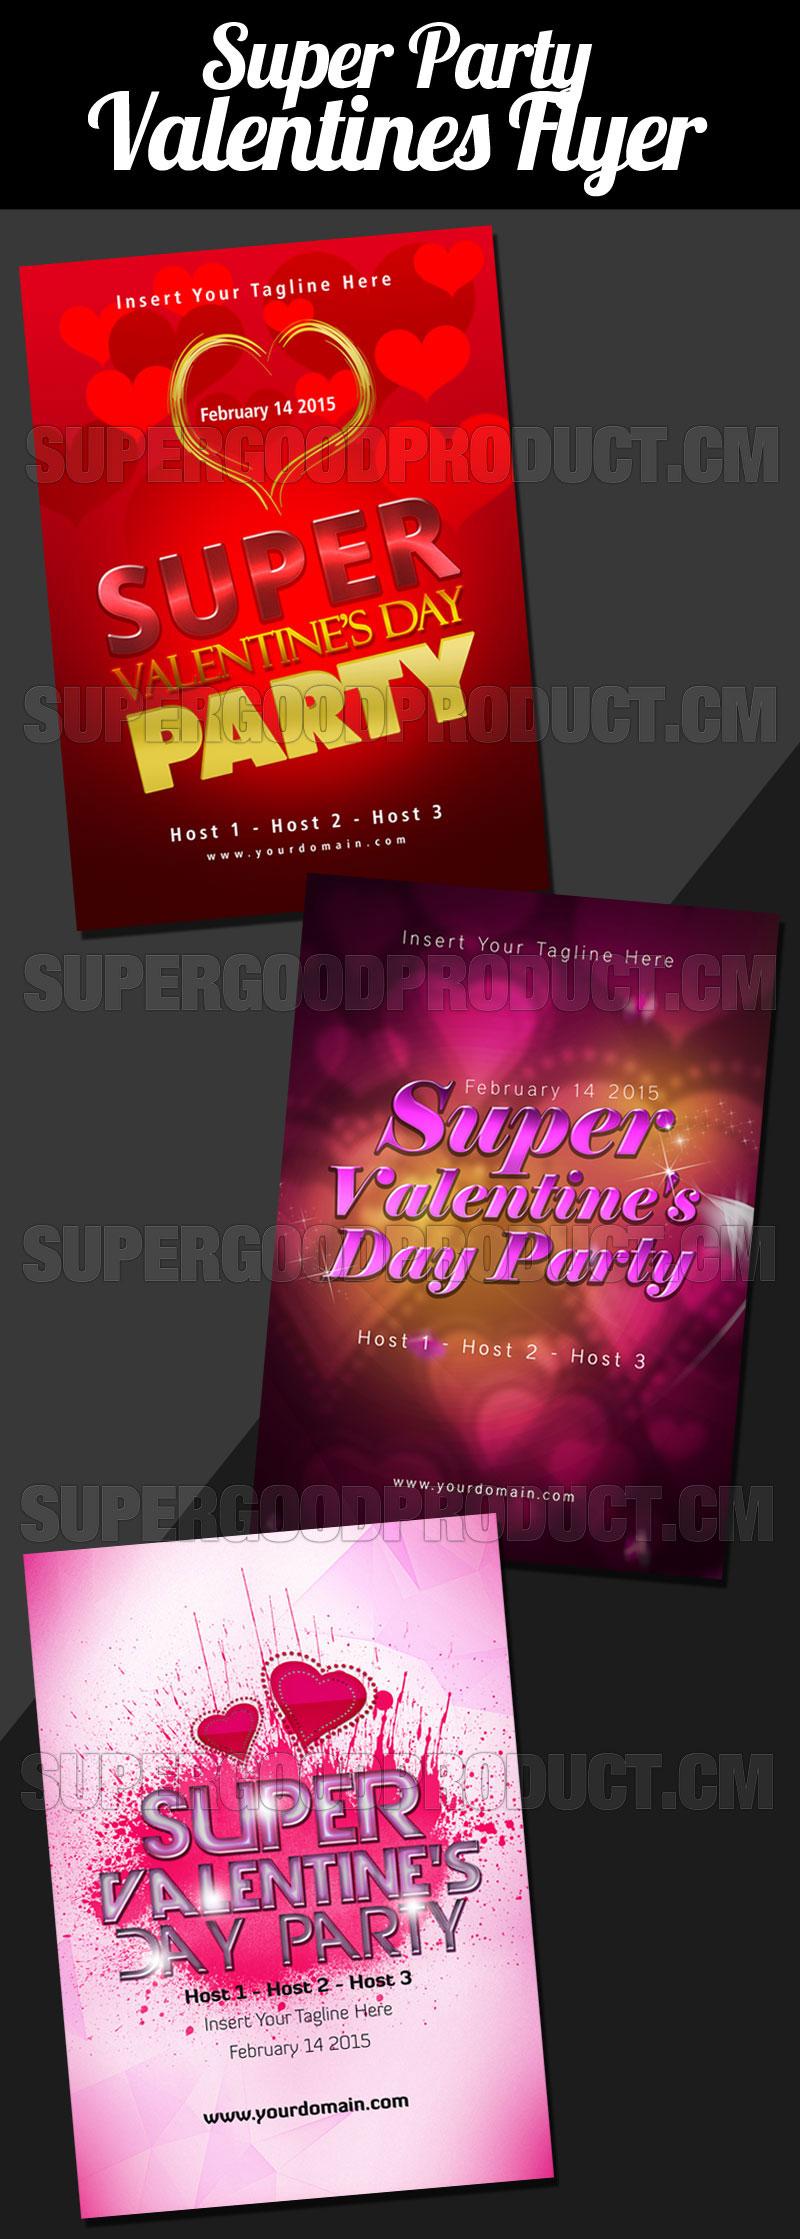 Super-Party-Valentines